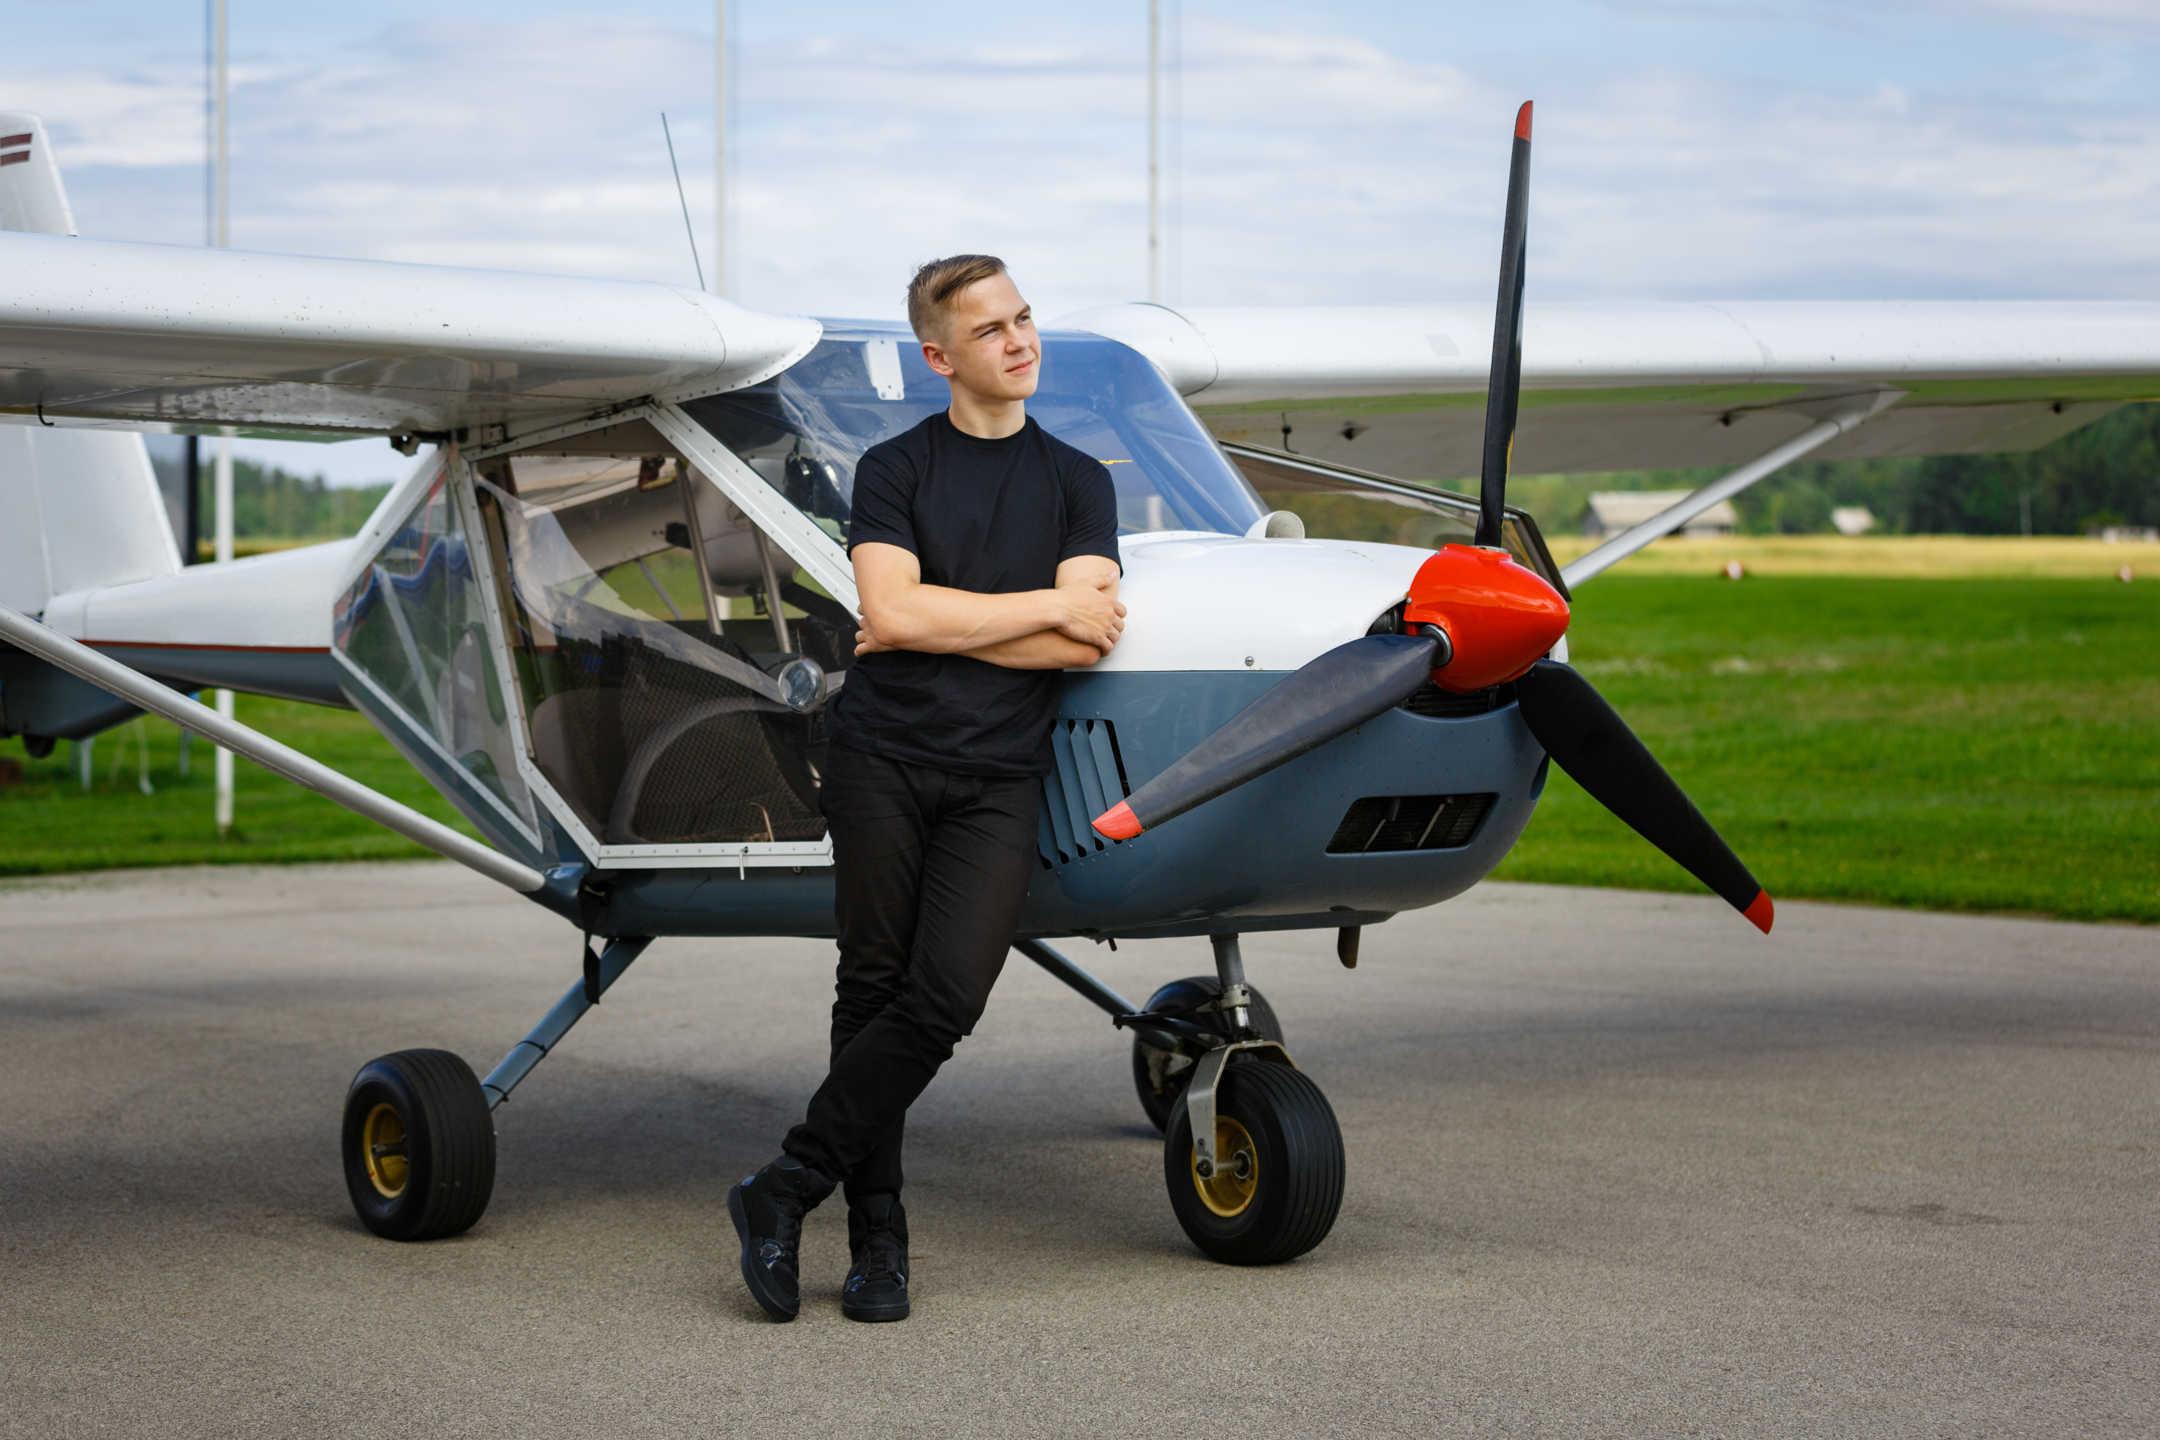 Attestato VDS per velivoli ultra leggeri a motore